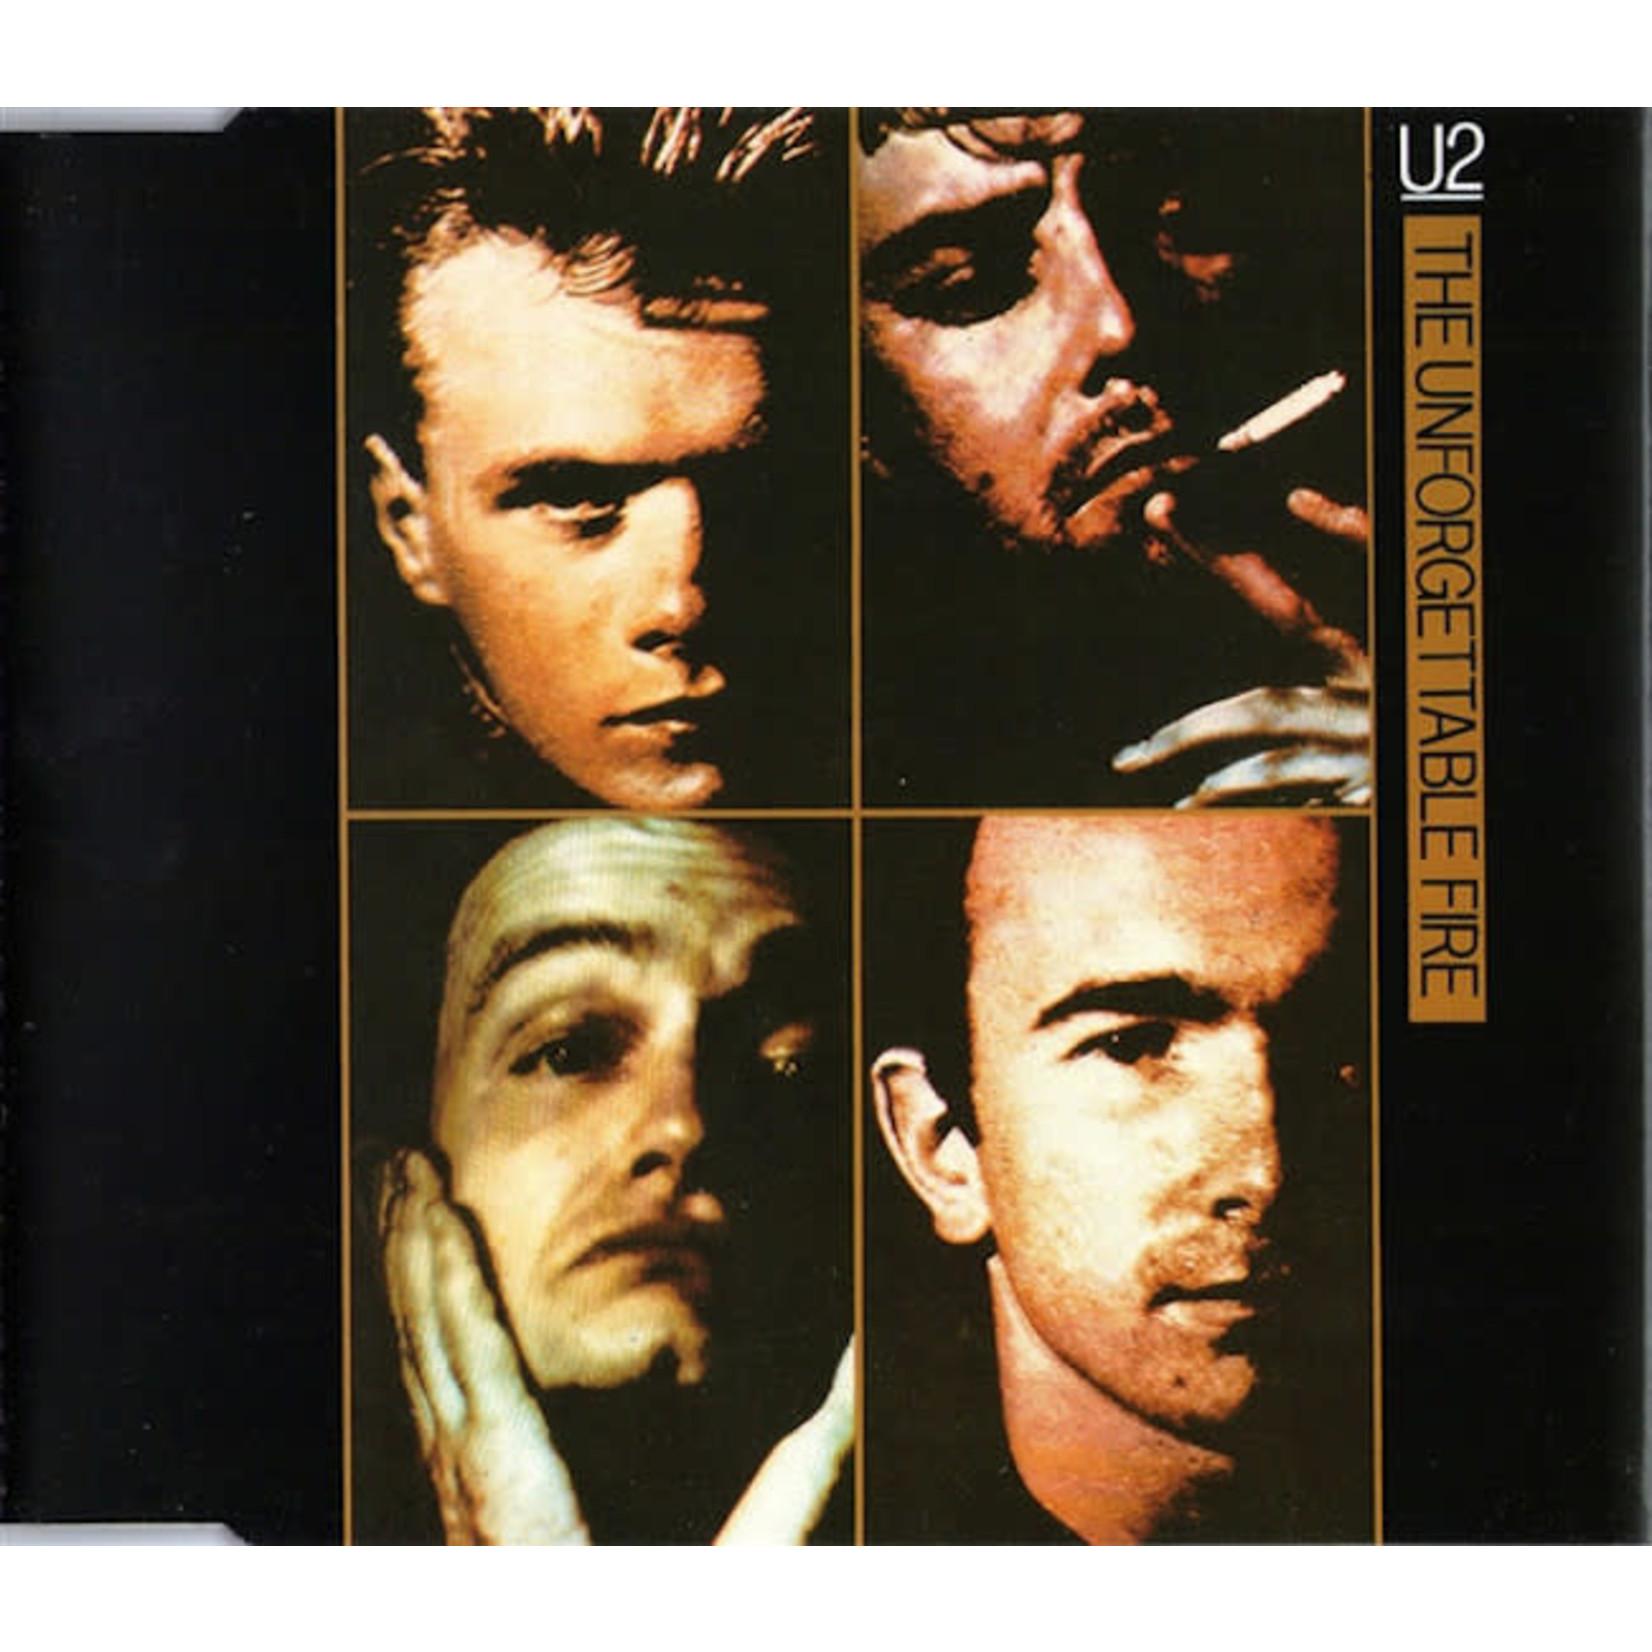 [Vintage] U2: The Unforgettable Fire (12''EP)